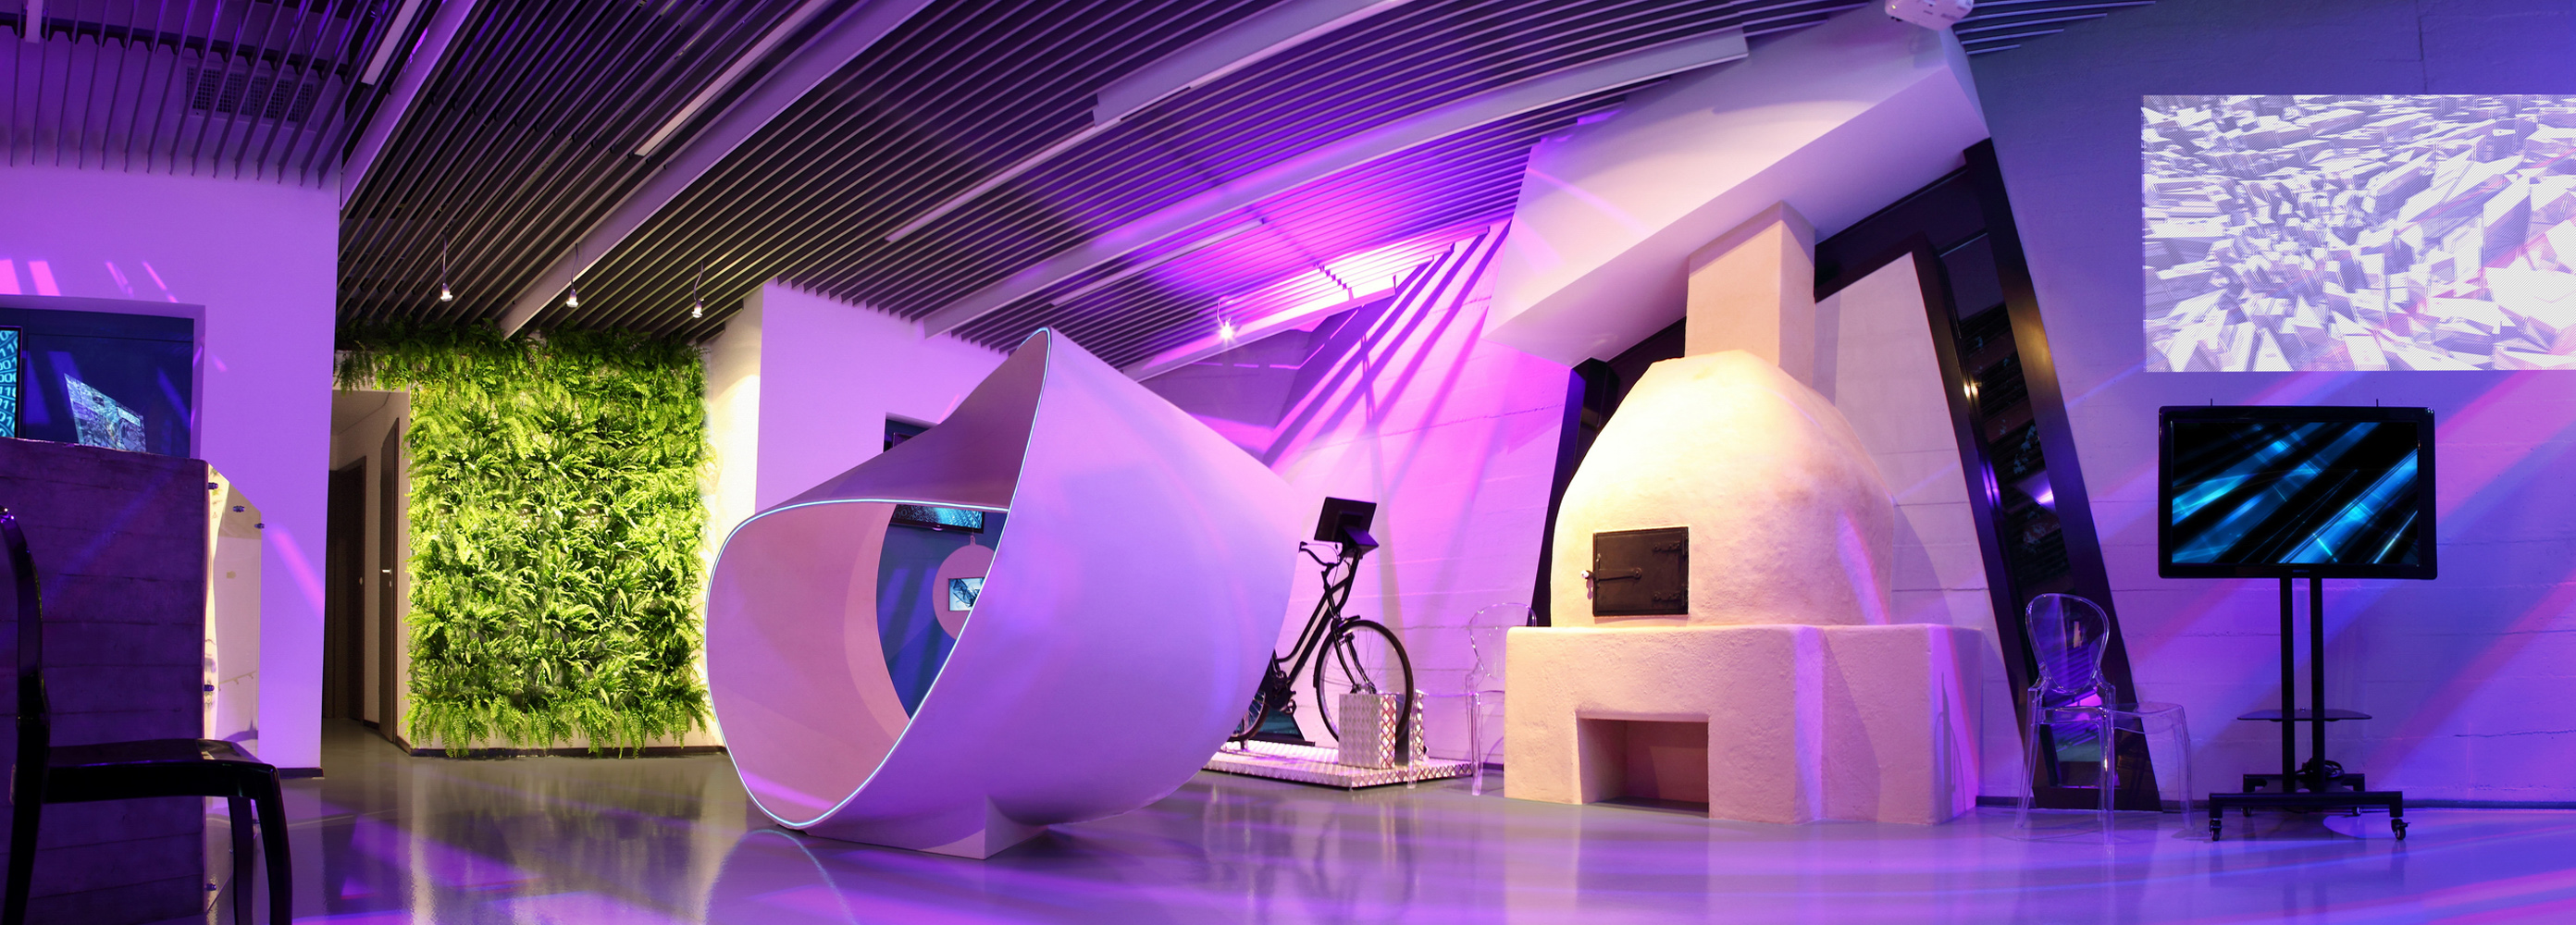 Interviu Cu Arhitectul Claudiu Ionescu Despre Proiectul Care A Pus